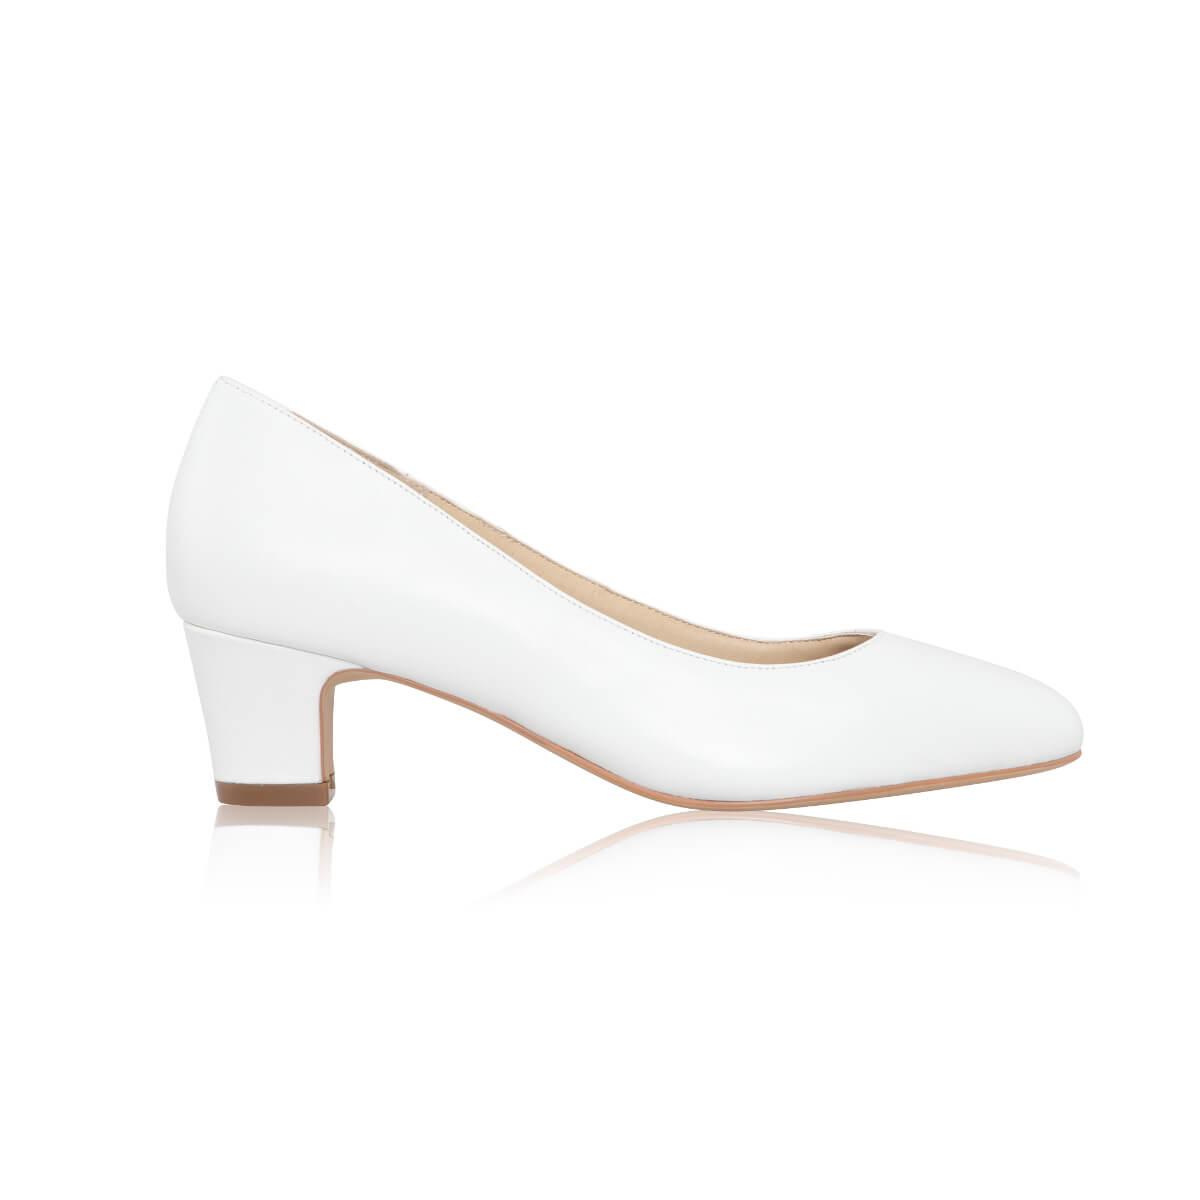 Melanie Leather - Low Heel Wedding